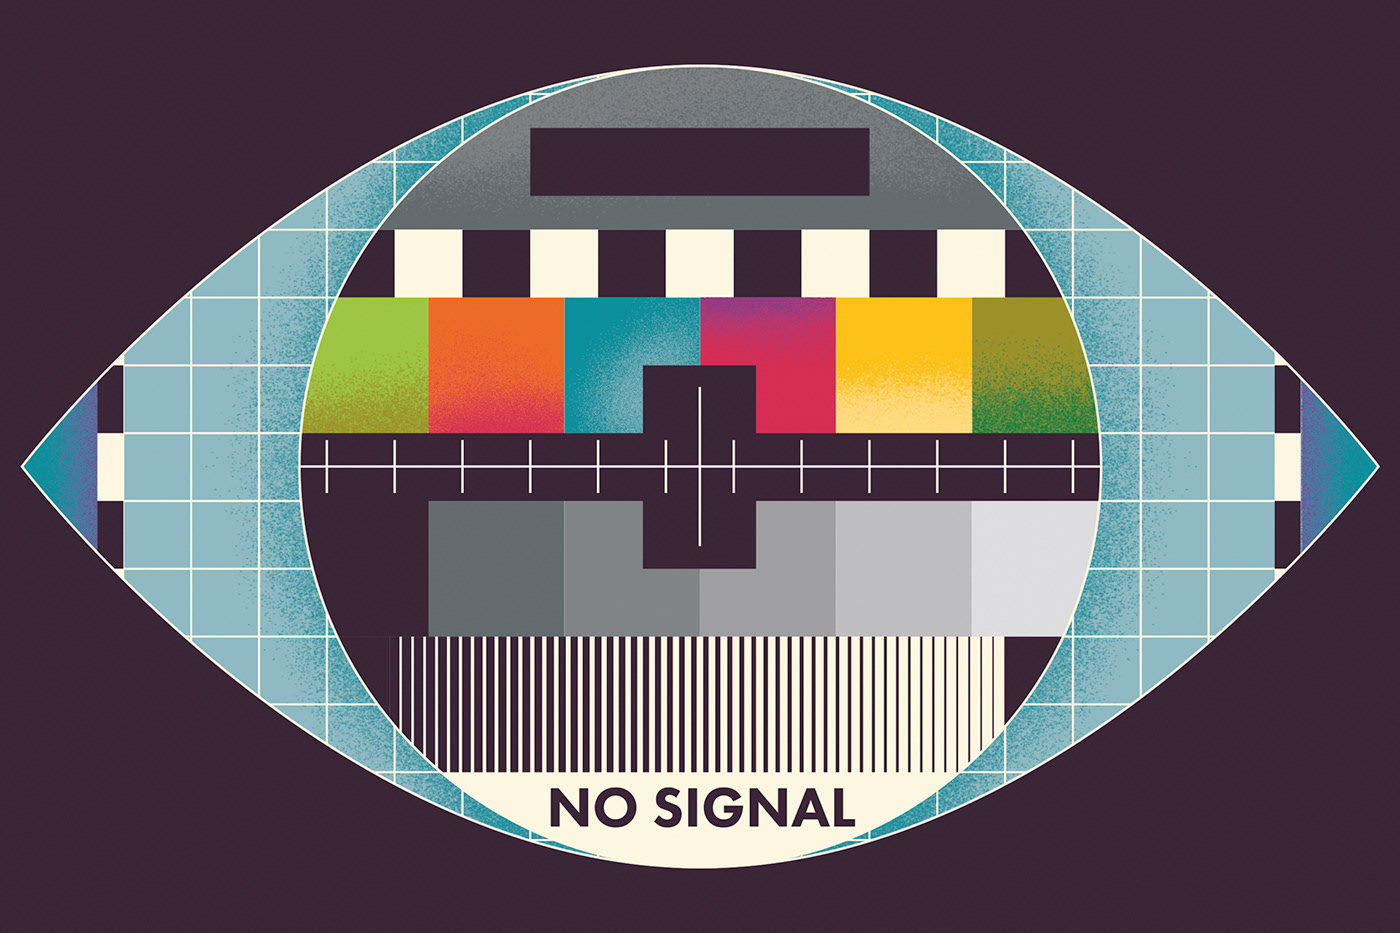 'No Signal' Illustration by Tom Redfern